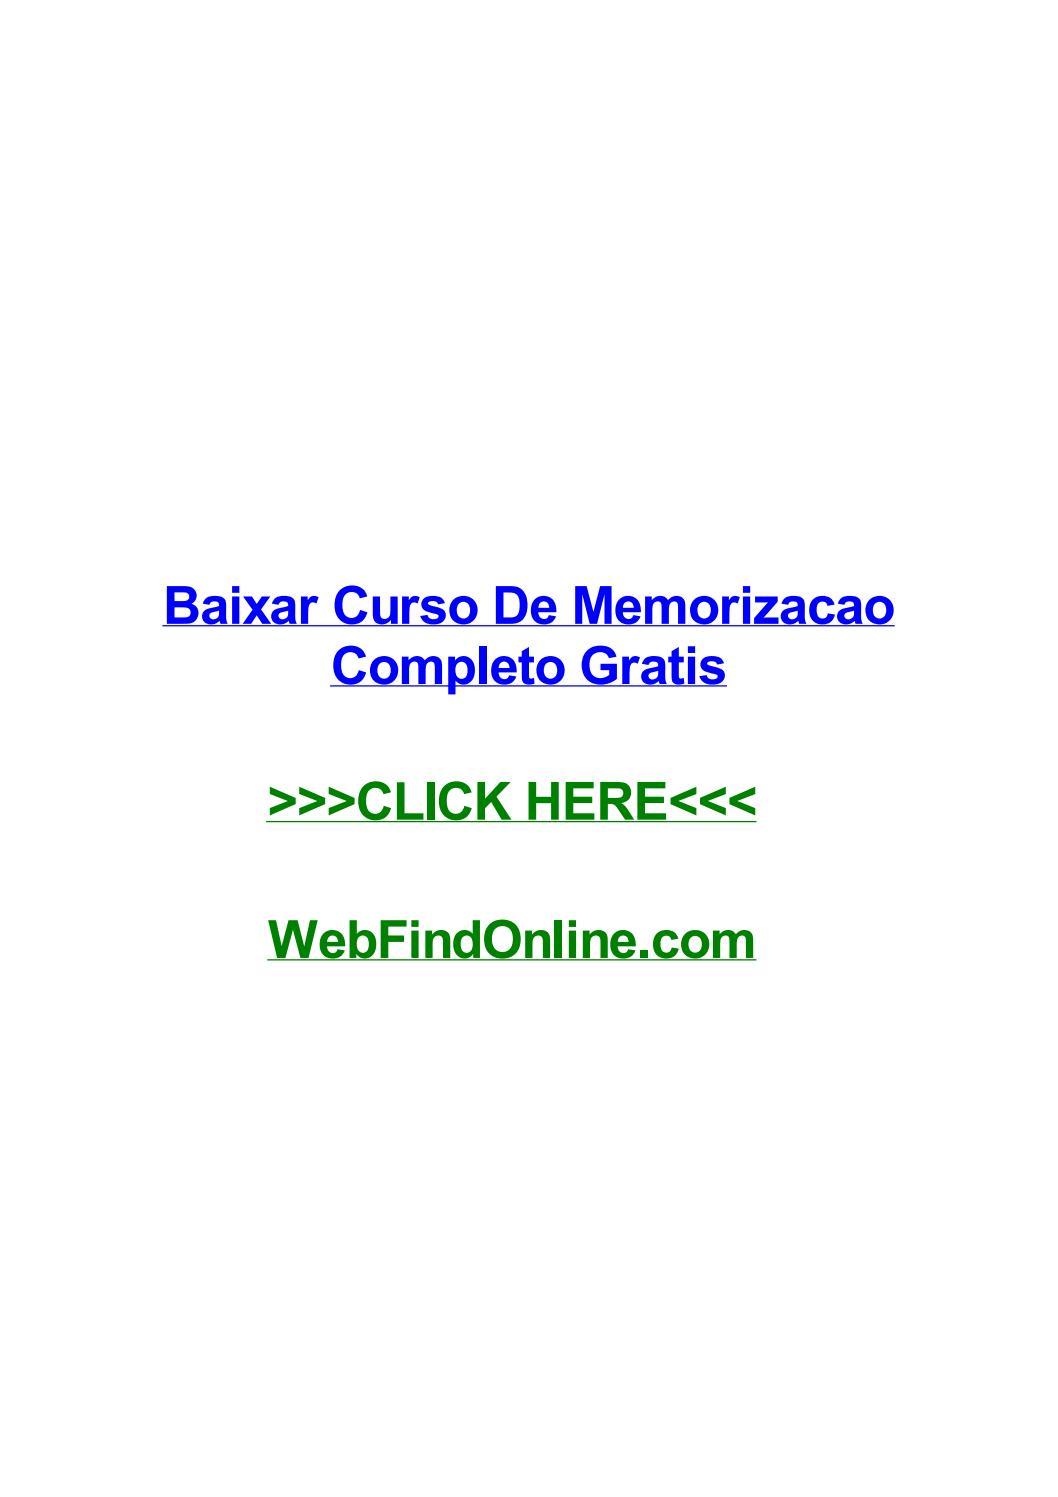 CALIGRAFIA BAIXAR INGLESA DE CURSO